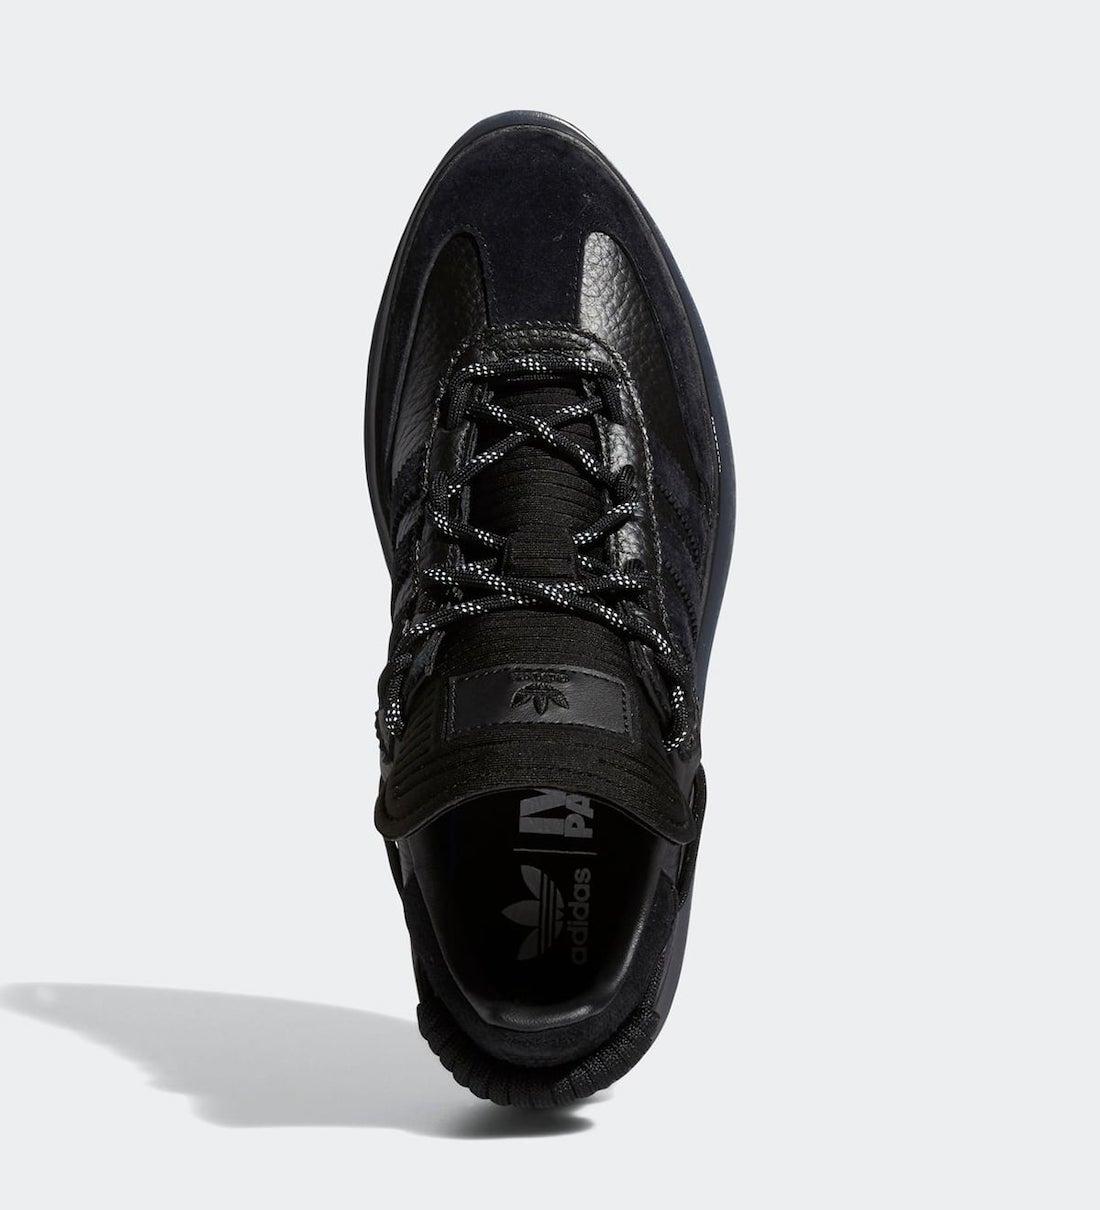 Beyonce Ivy Park adidas Sleek Super 72 Black FZ4386 Release Date Info